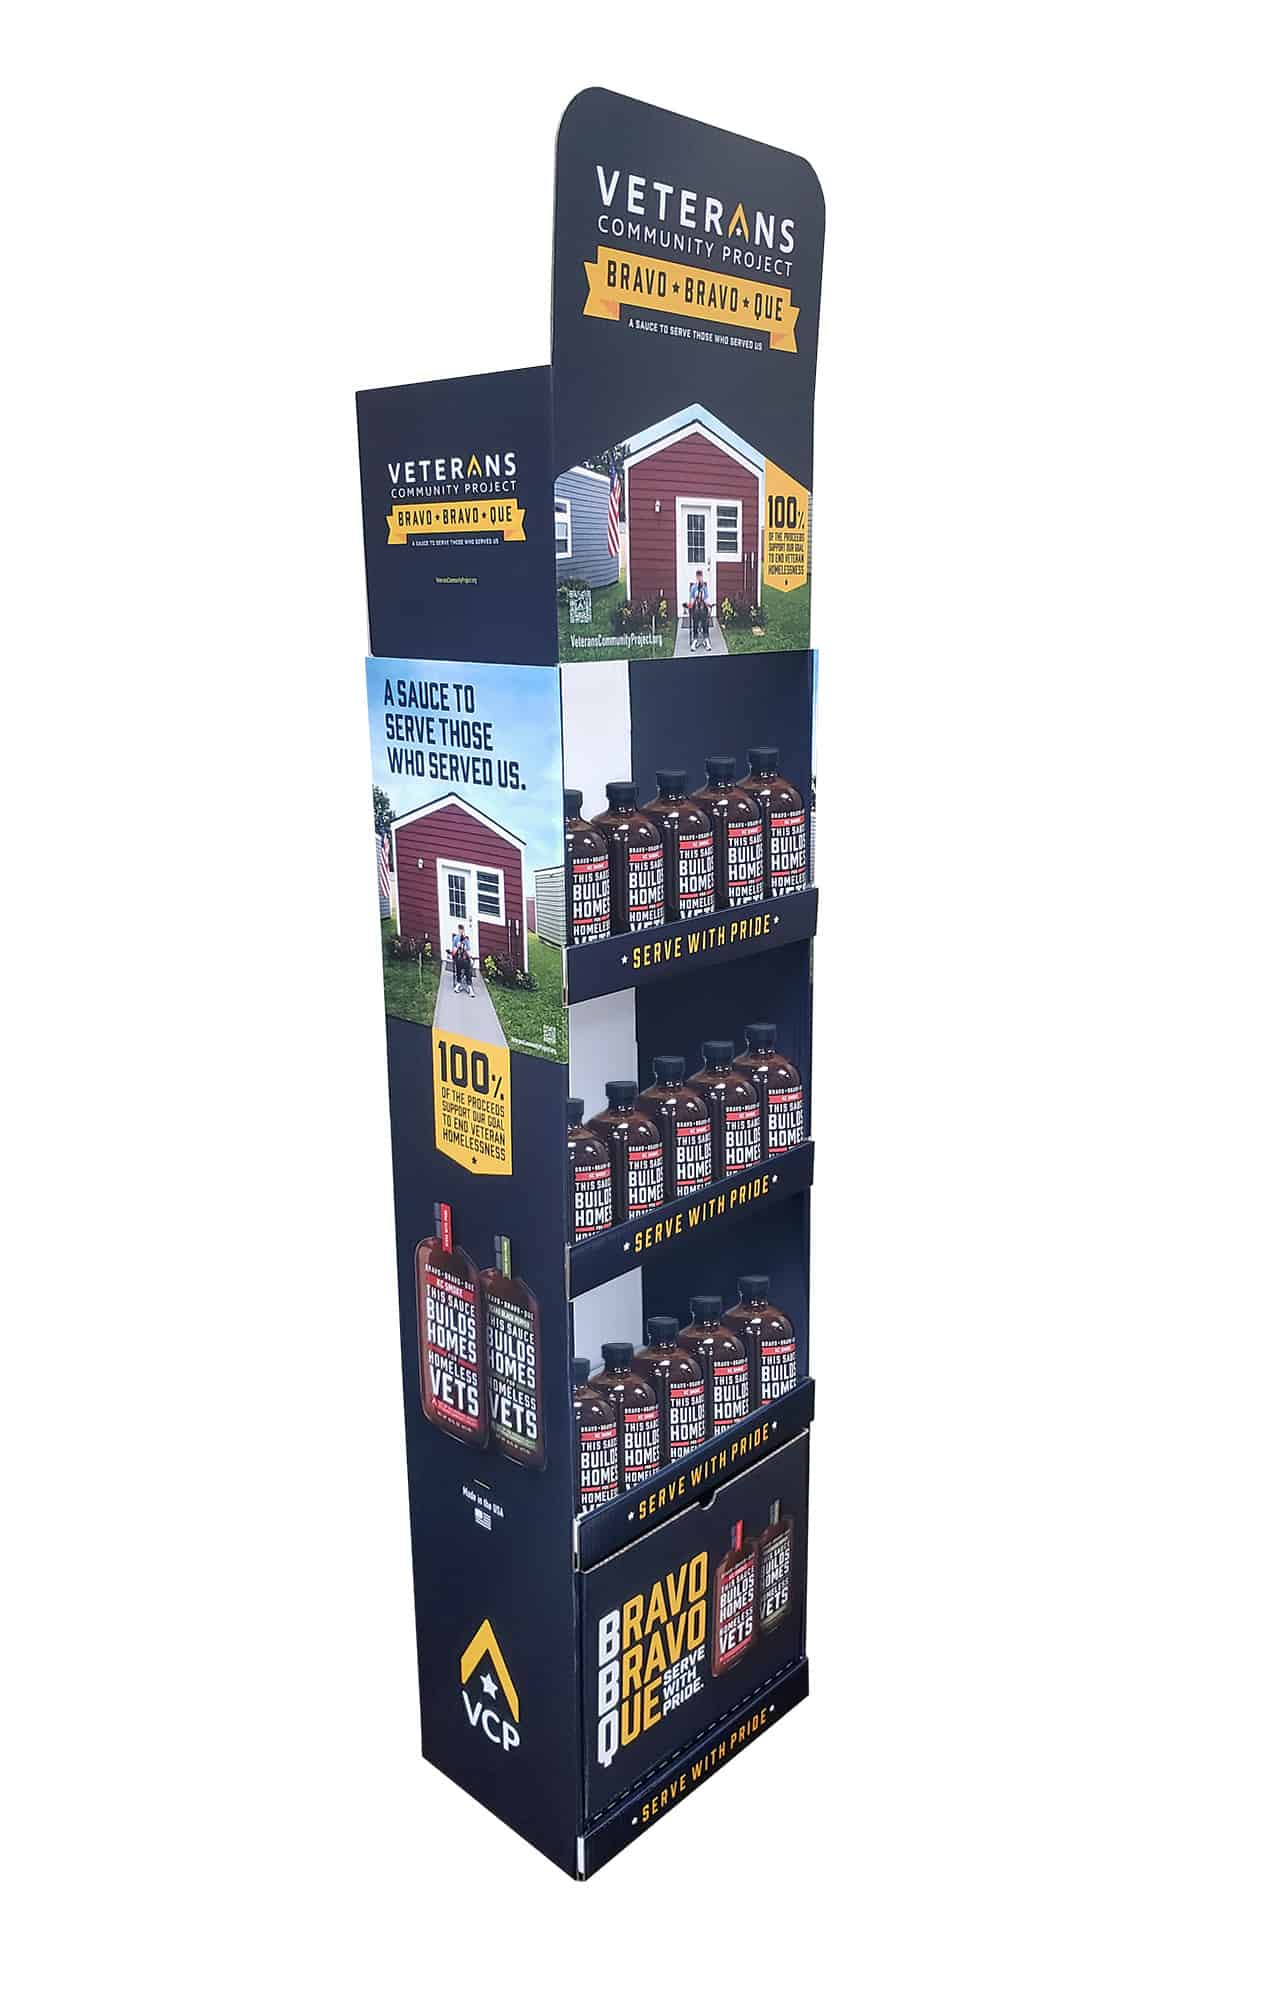 A tall floorstand BBQ POP display with text 'Veterans Community Project Bravo Bravo Que'